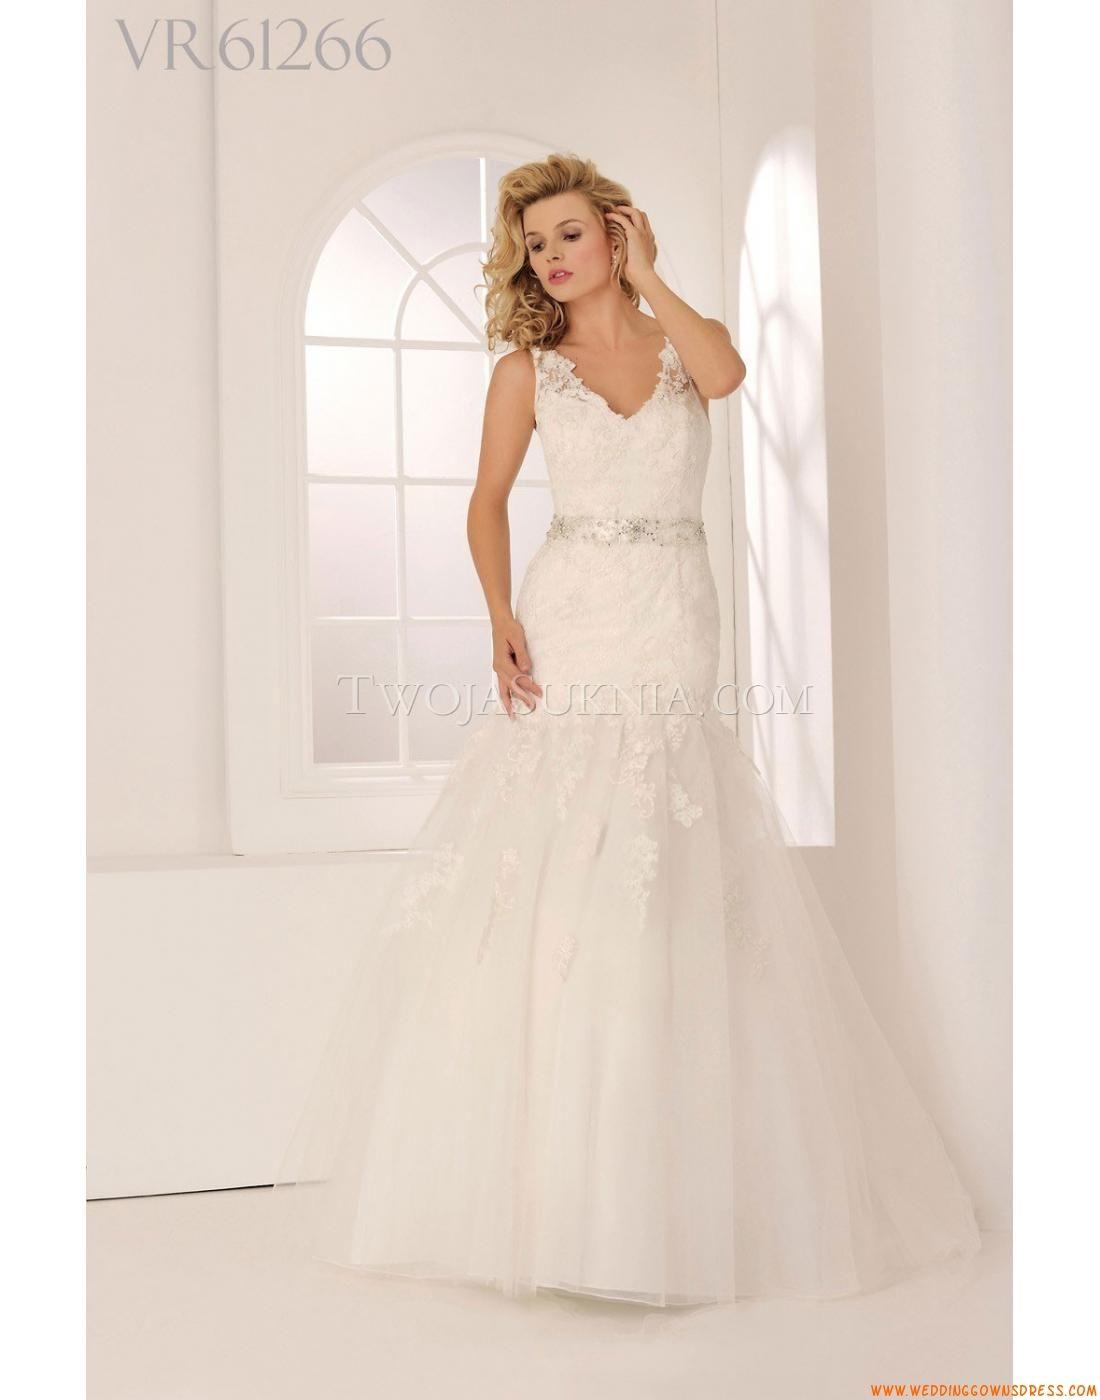 Cheap rustic wedding dresses  Wedding Dress Veromia VR  Veromia  My favorite gowns